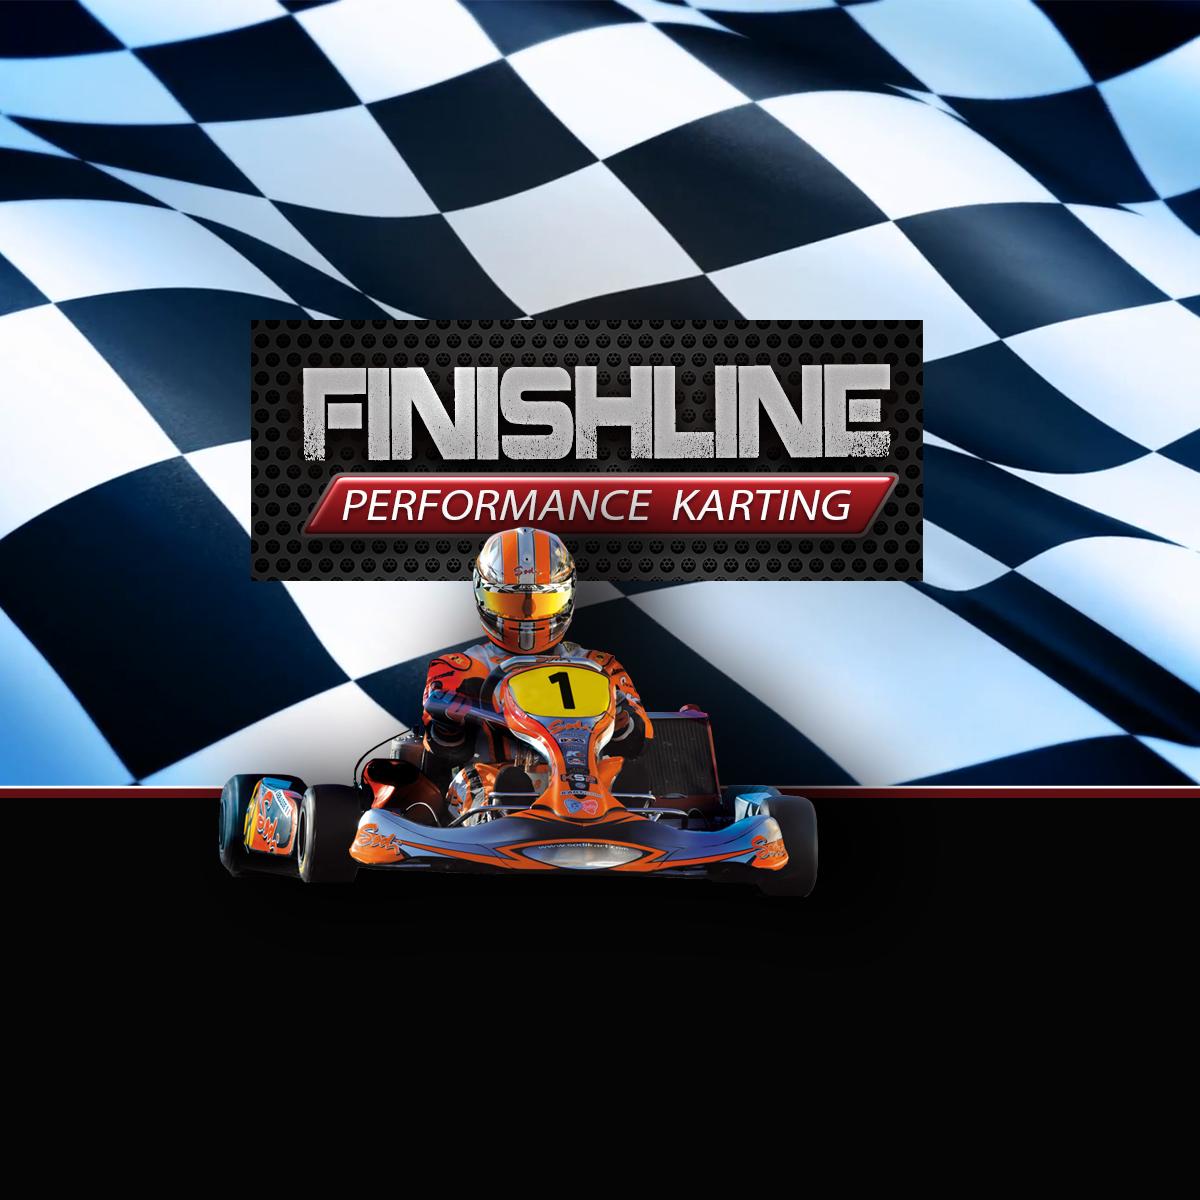 Finishline Performance Karting - Biloxi MS